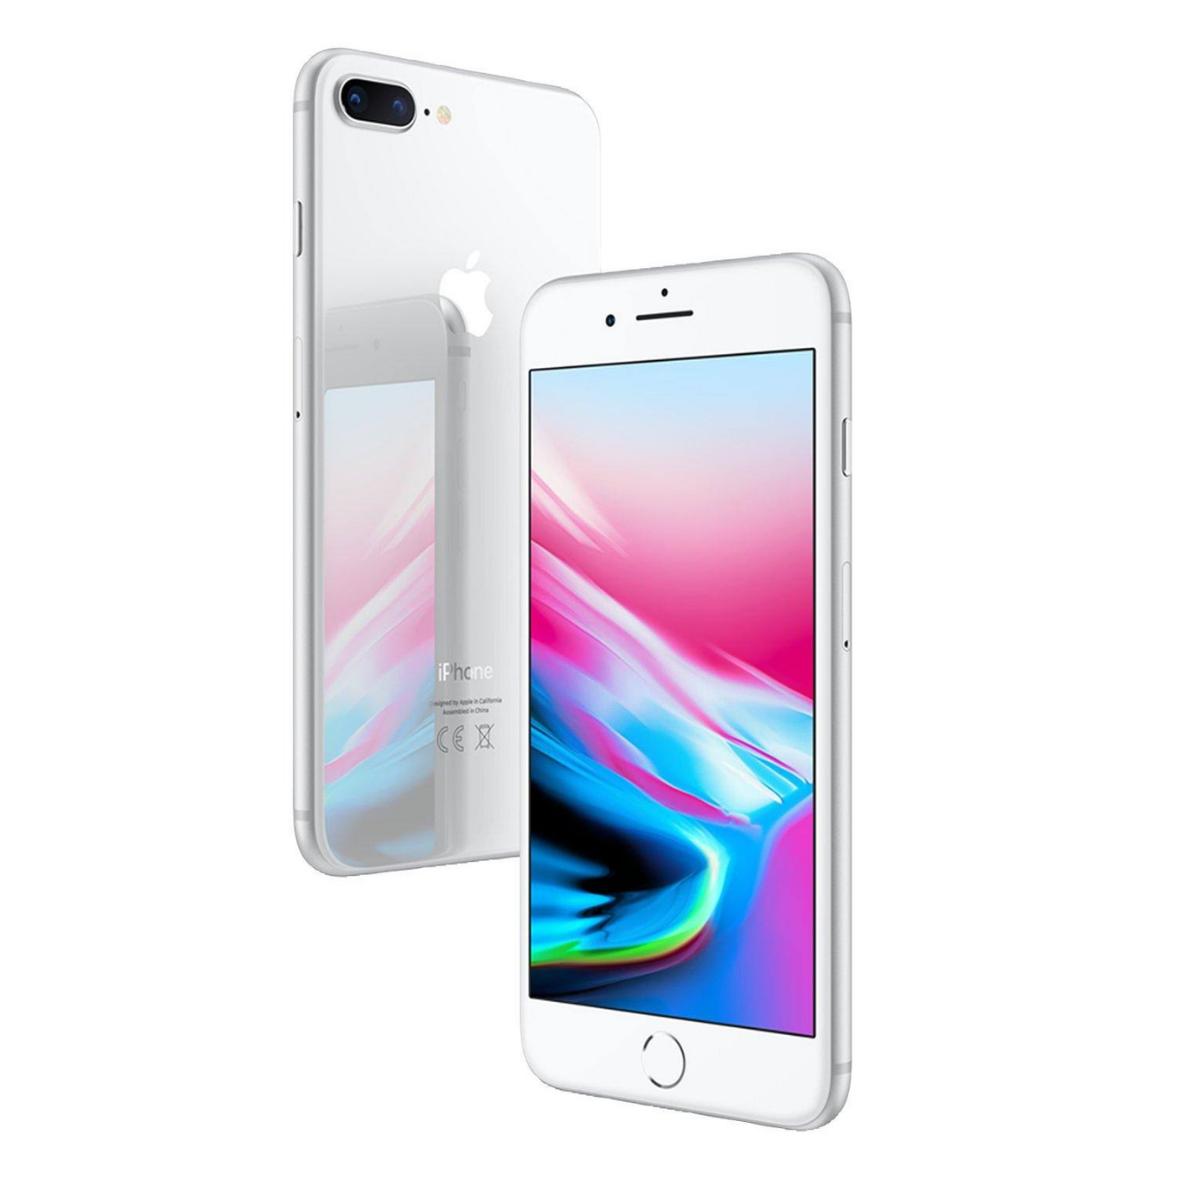 Sim Free Apple iPhone 8 Plus 64GB Unlocked Mobile Phone - Silver